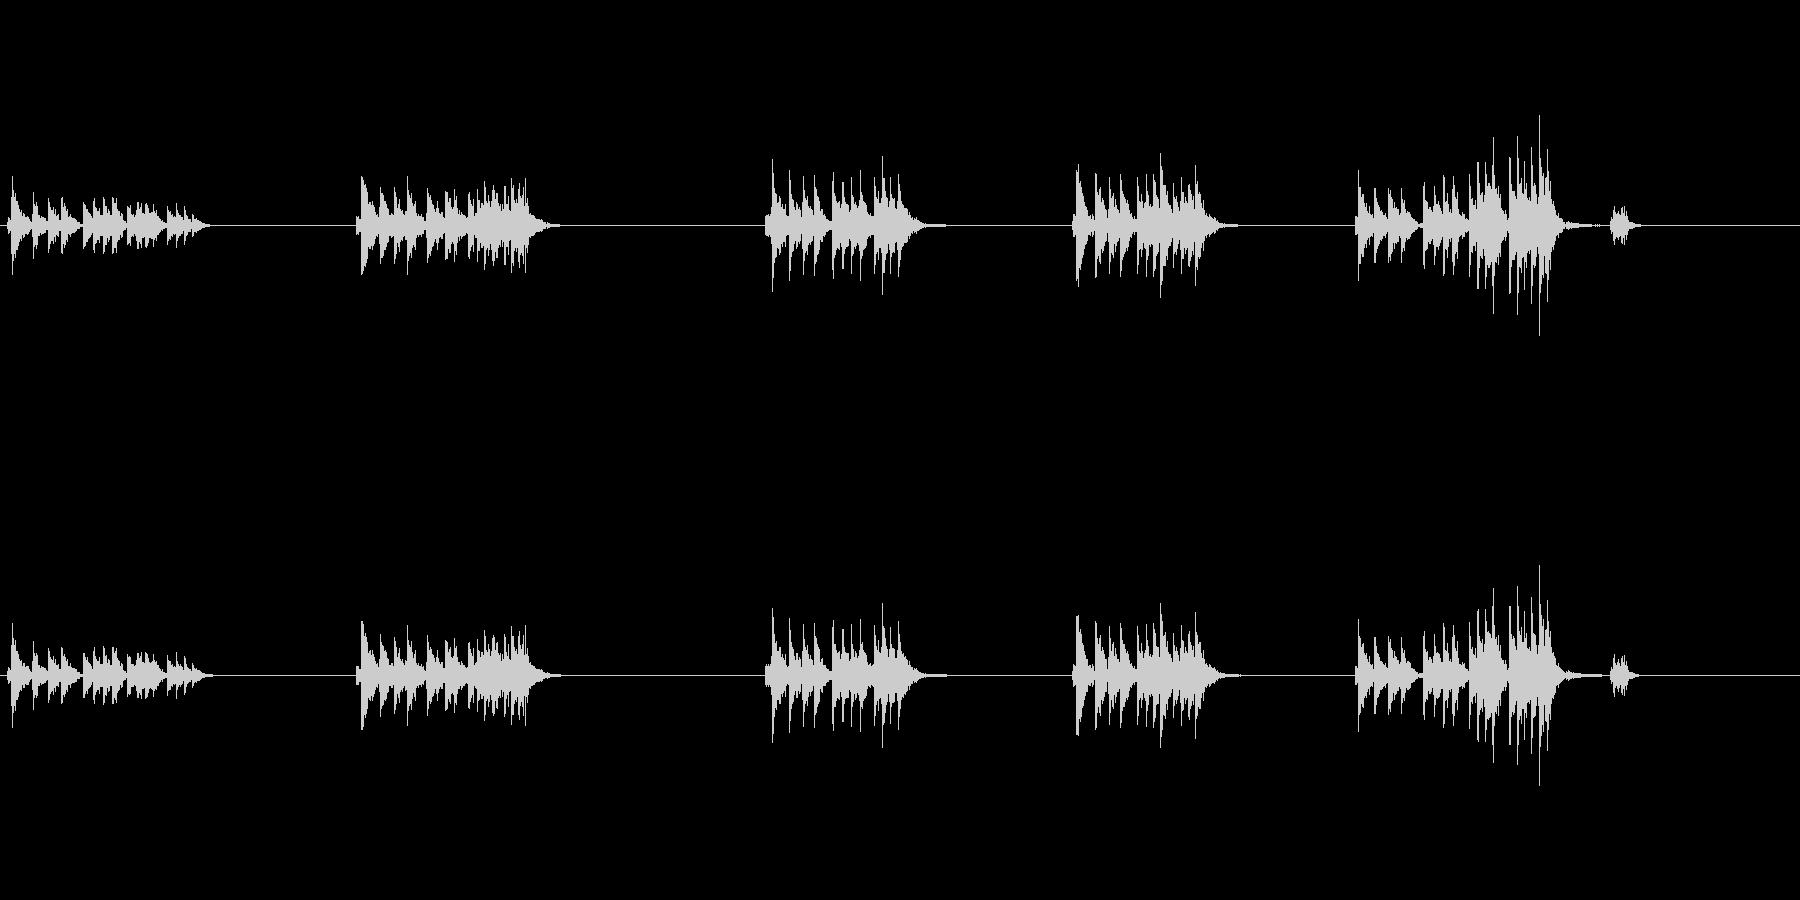 大太鼓5ウス風音歌舞伎情景描写和風和太鼓の未再生の波形